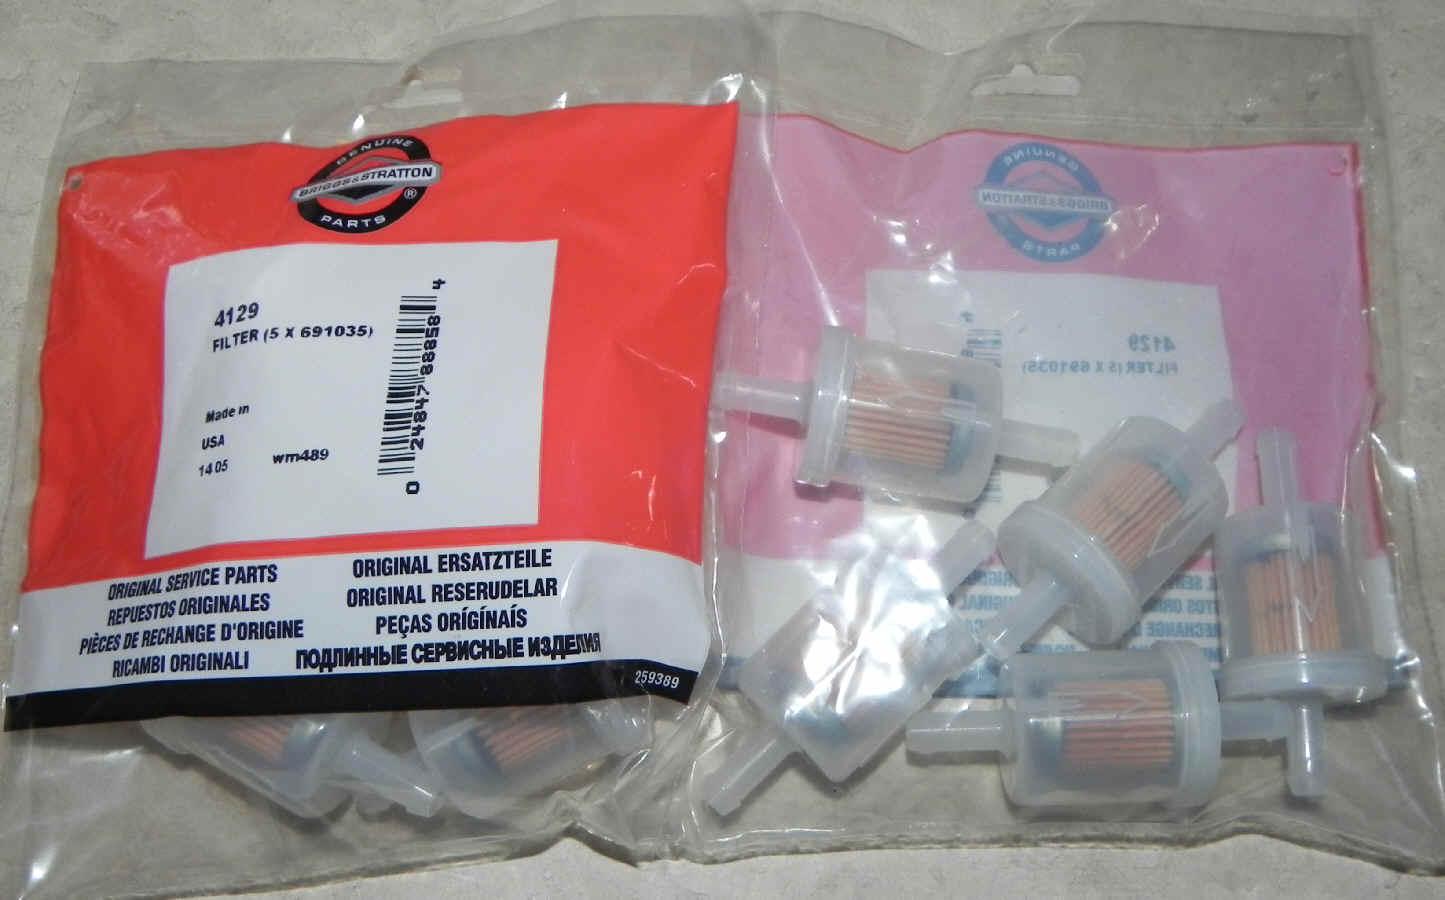 Briggs & Stratton Fuel Filters Part No. 84001895M